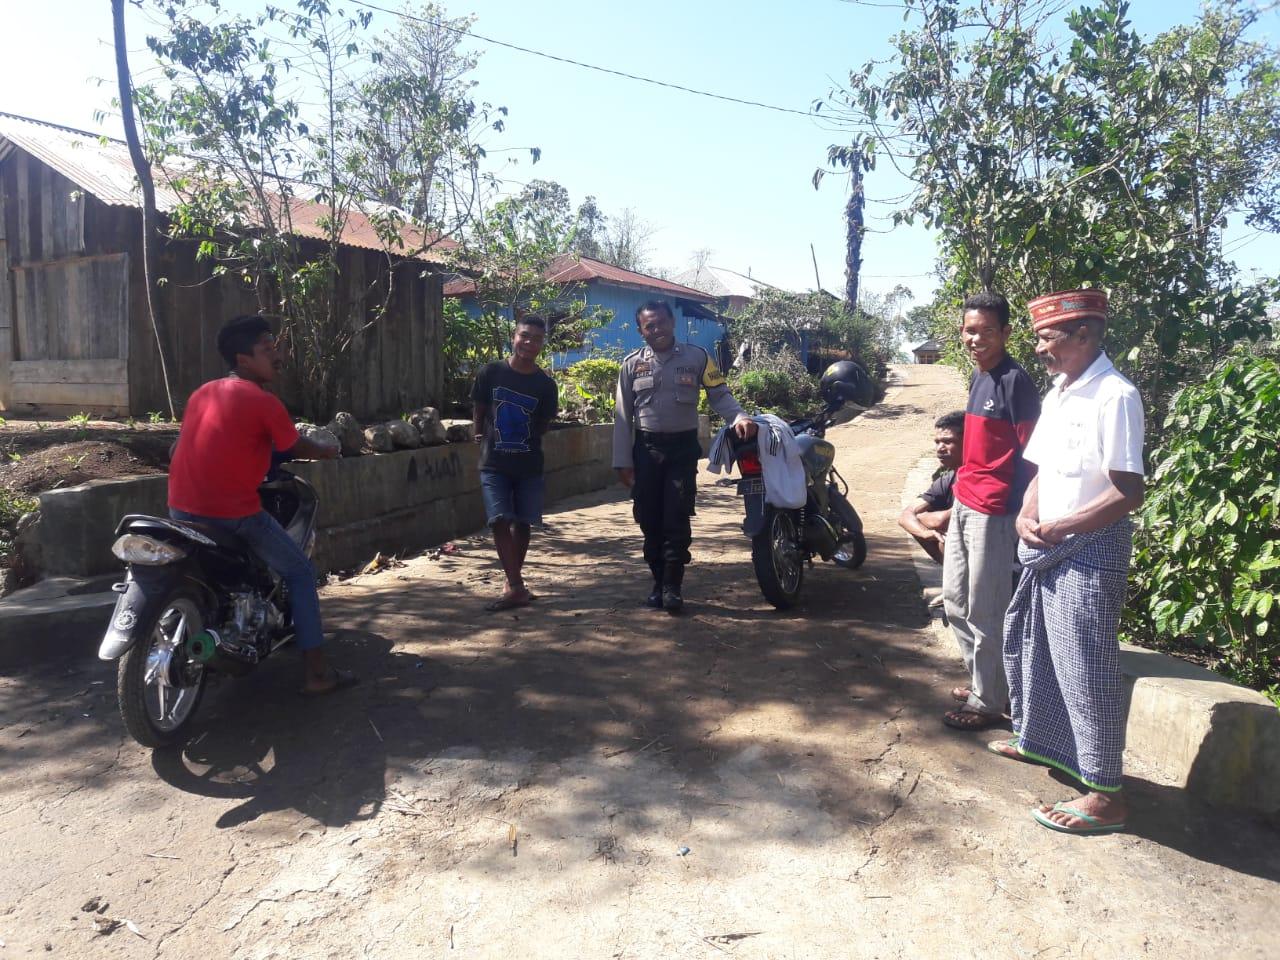 Bhabinkamtibmas Desa Pong La'o, sambangi warga binaan